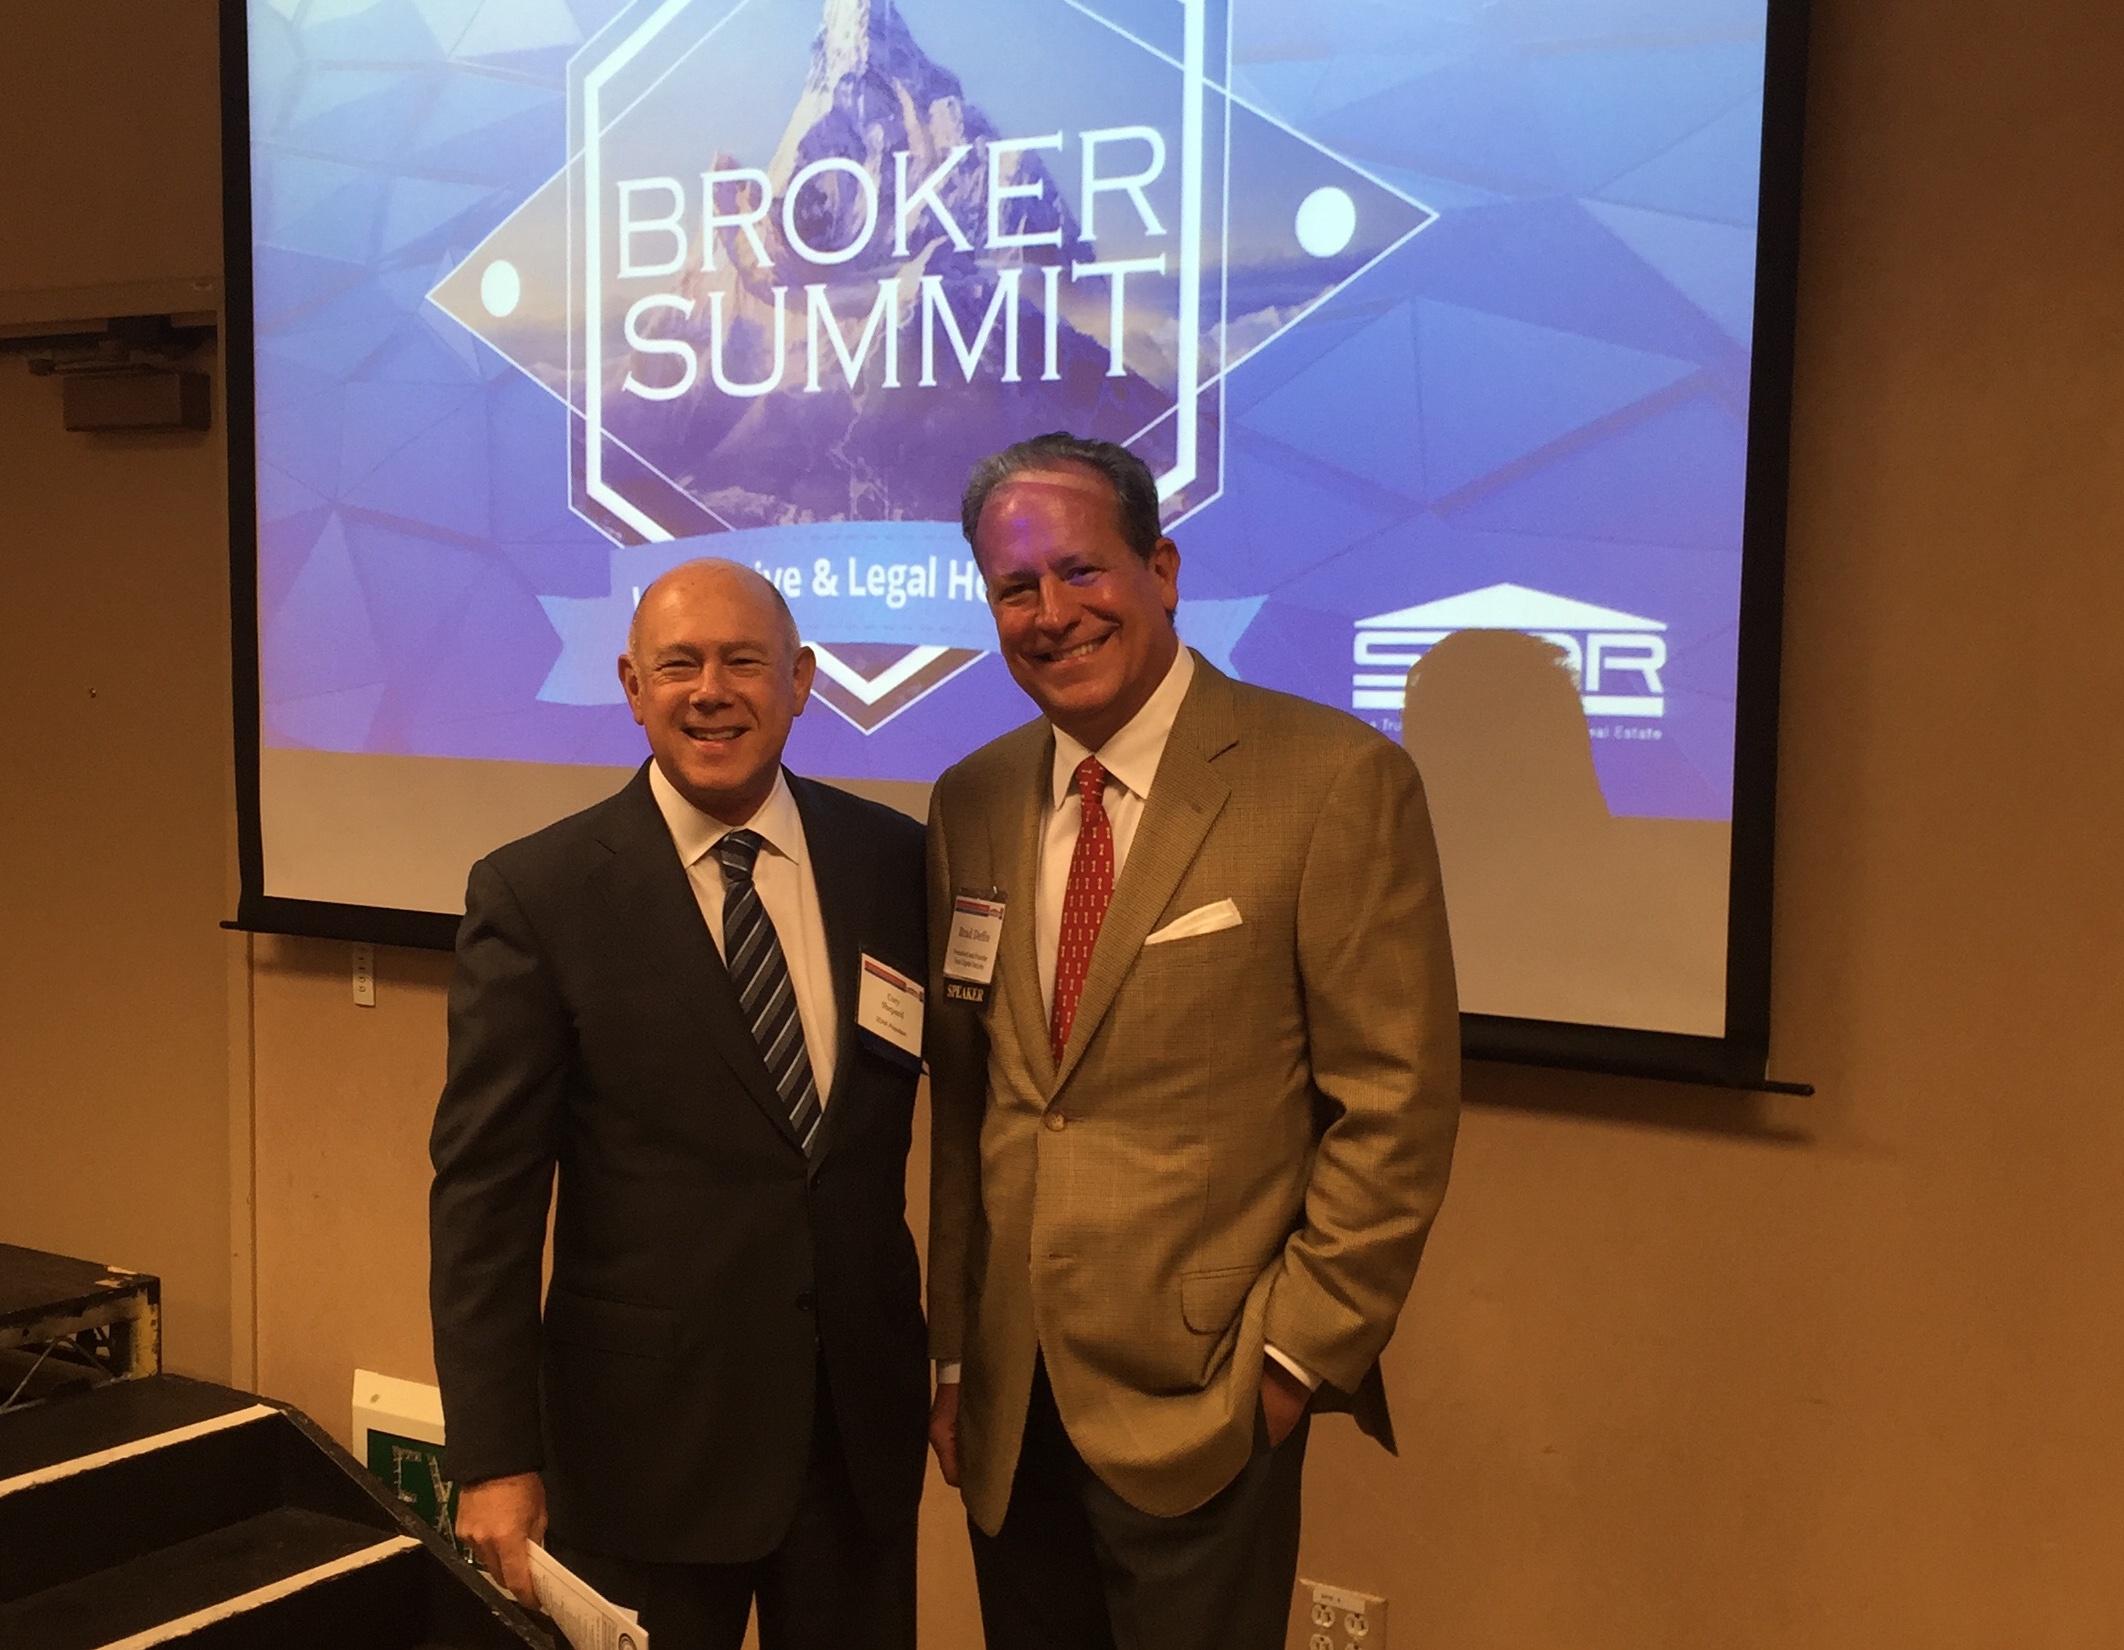 SDAR_Broker_Summit_2016_Brad_Deflin_and_Cory_Shepard.jpg